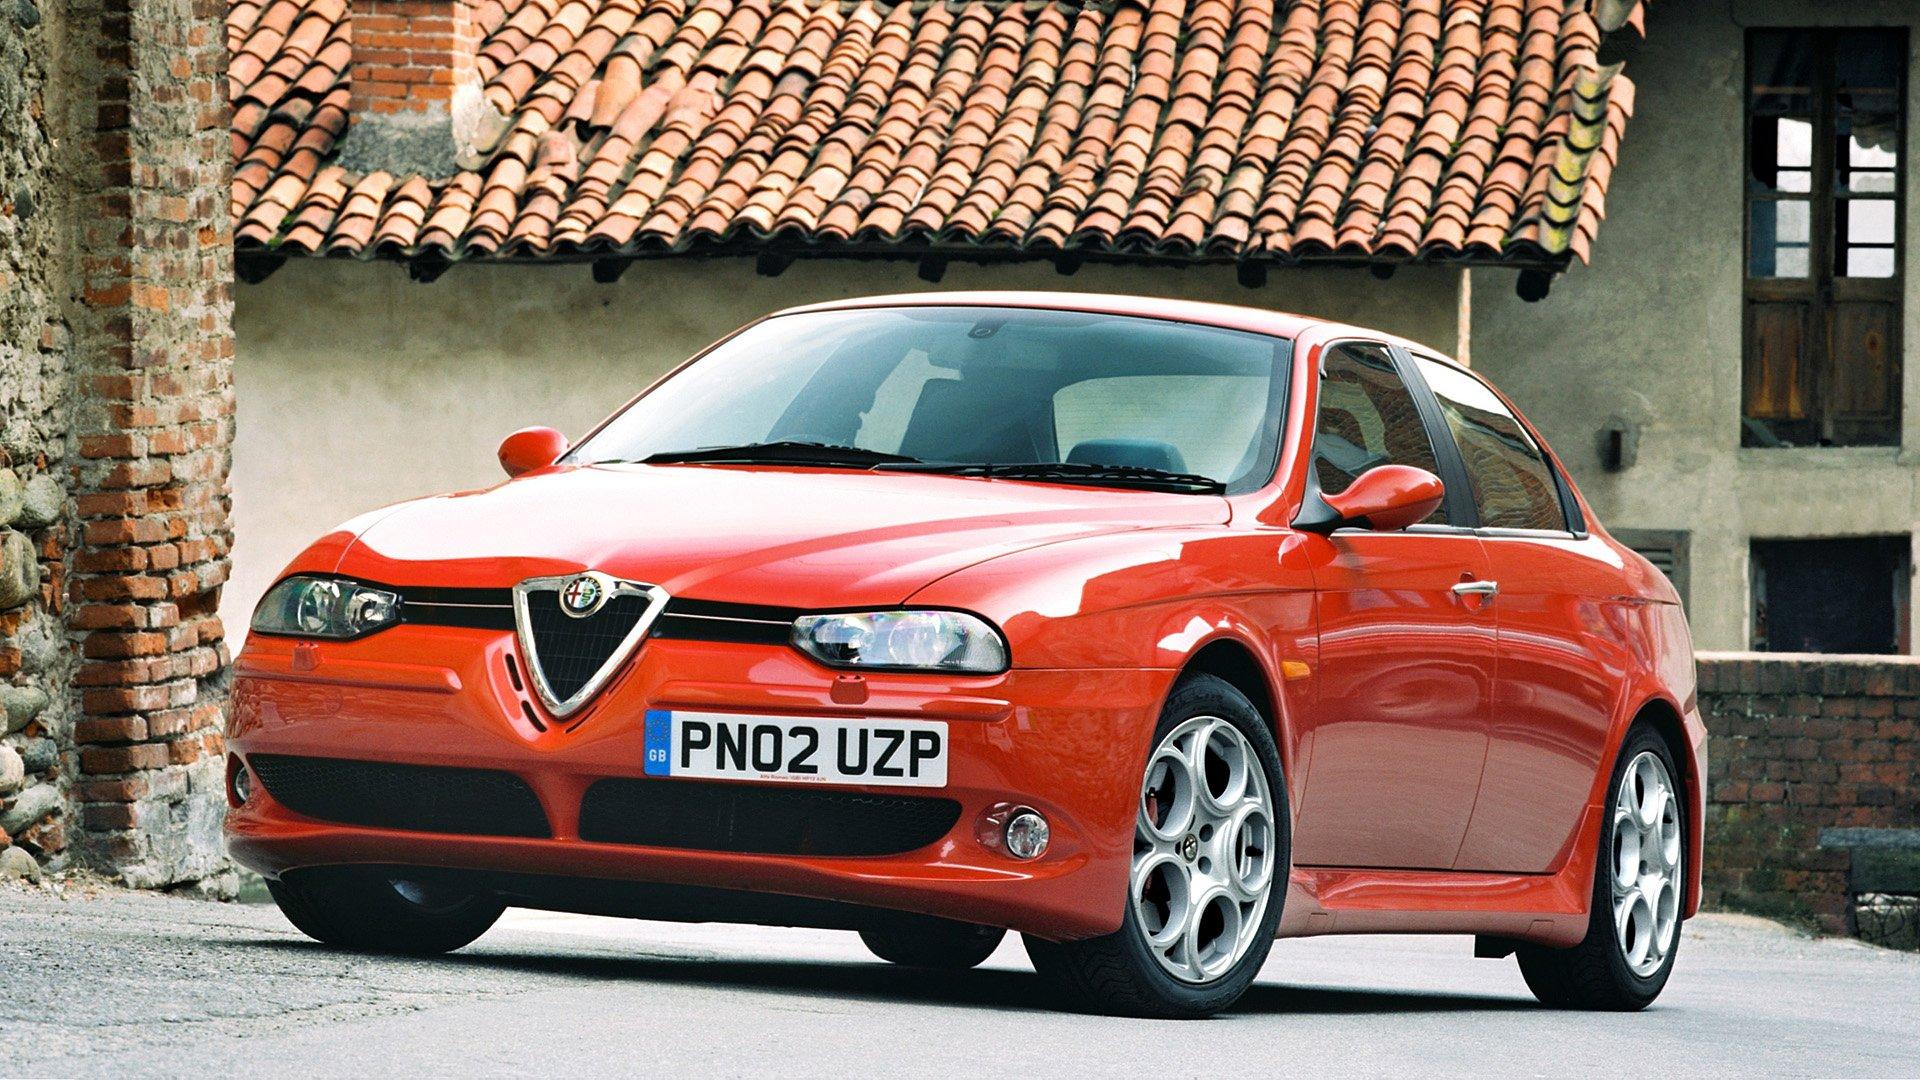 2002 Alfa Romeo 156 Gta Hd Wallpaper Background Image